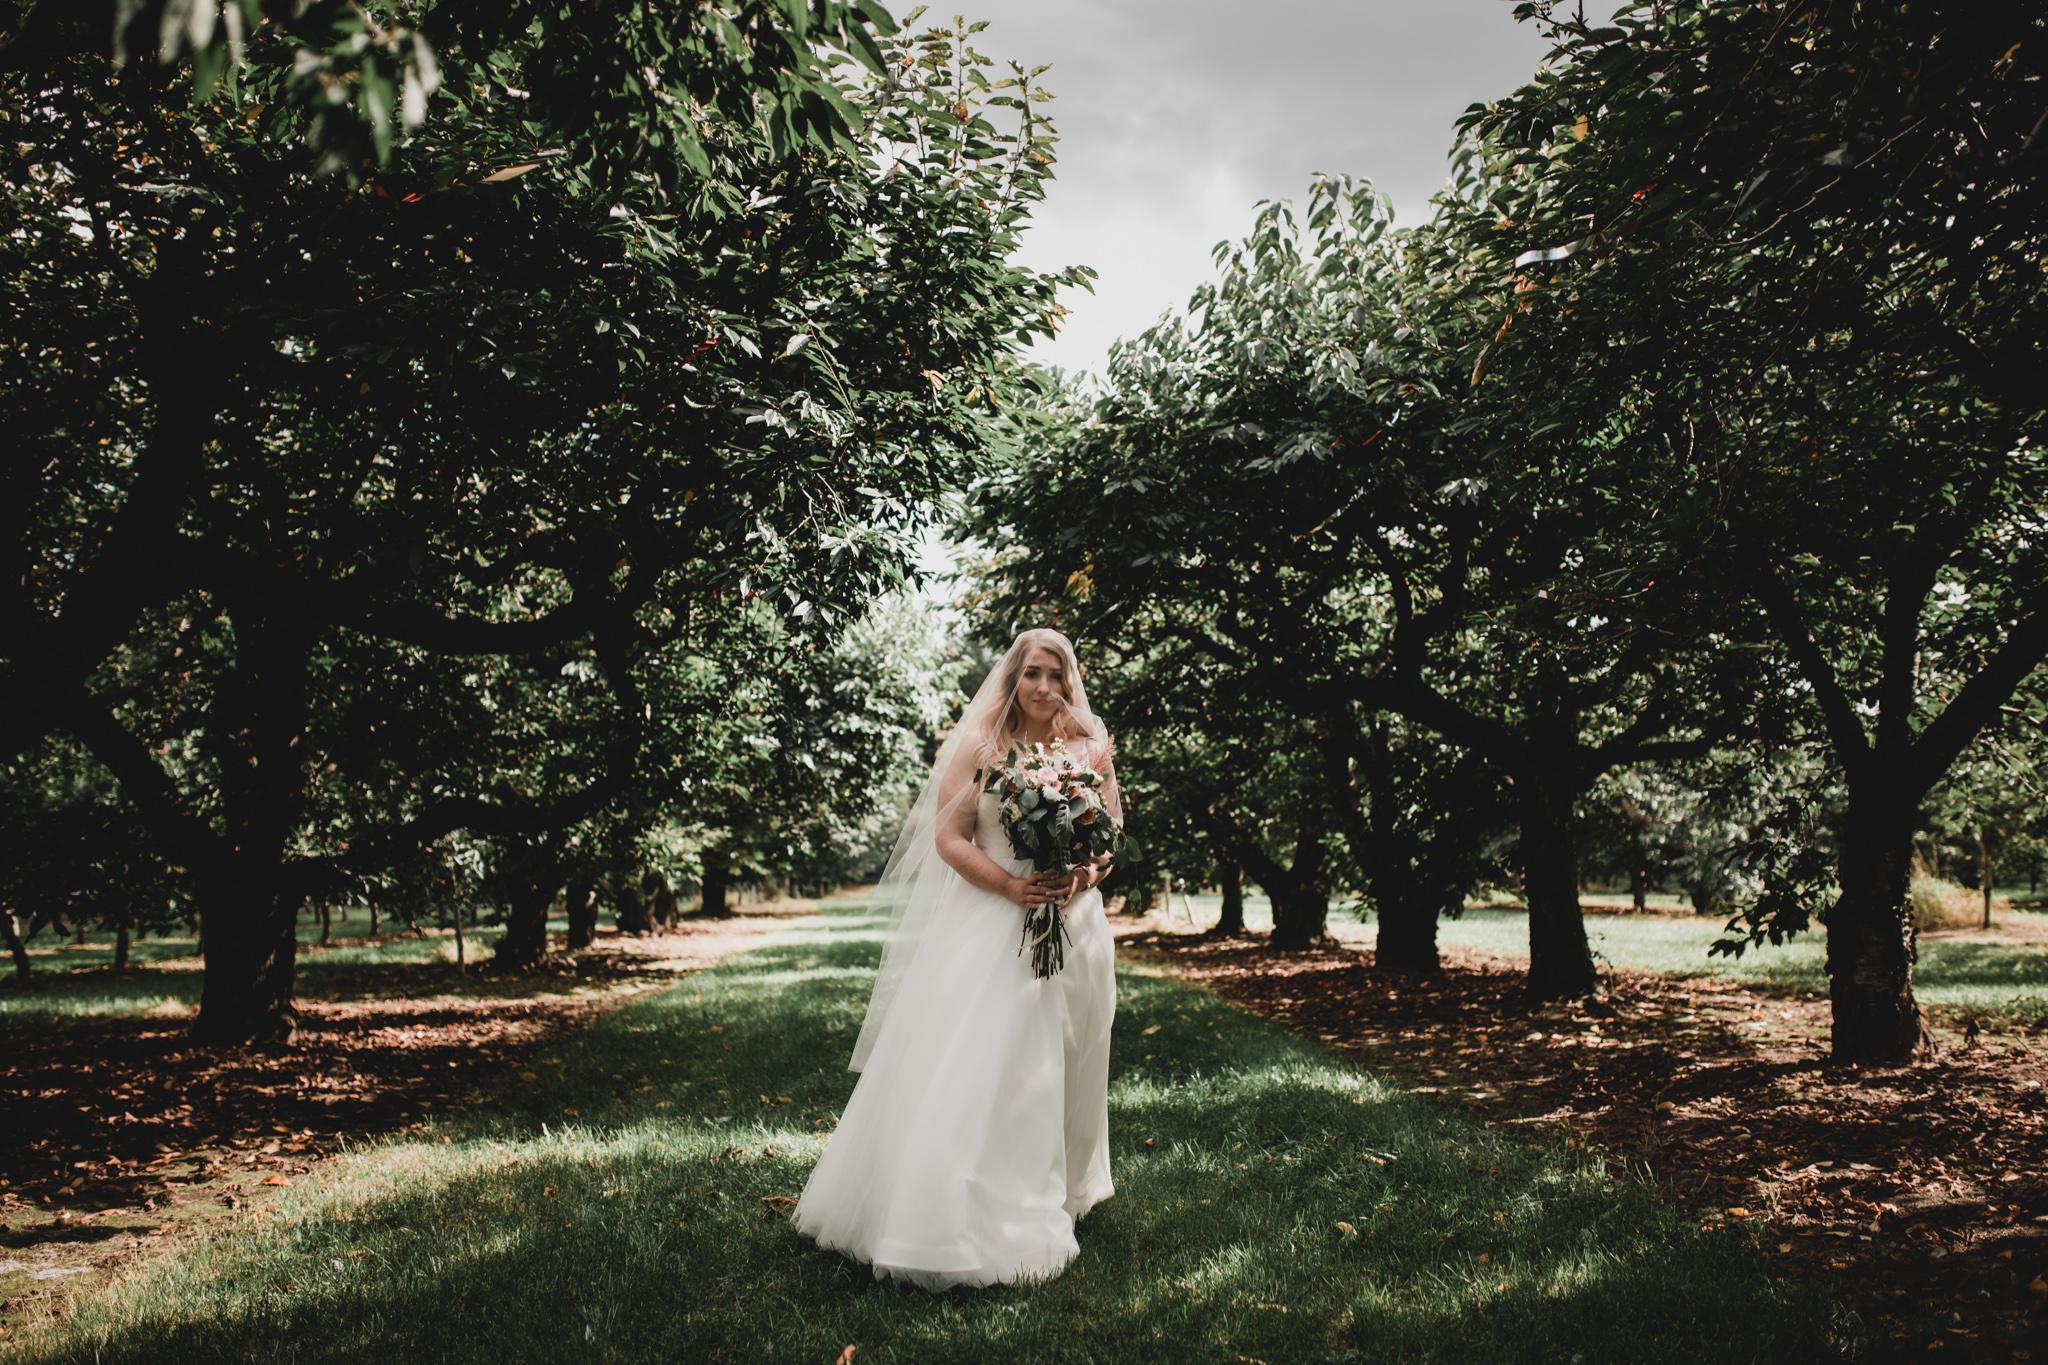 Wedding Photographers in Ottawa, Peterborough, Kingston